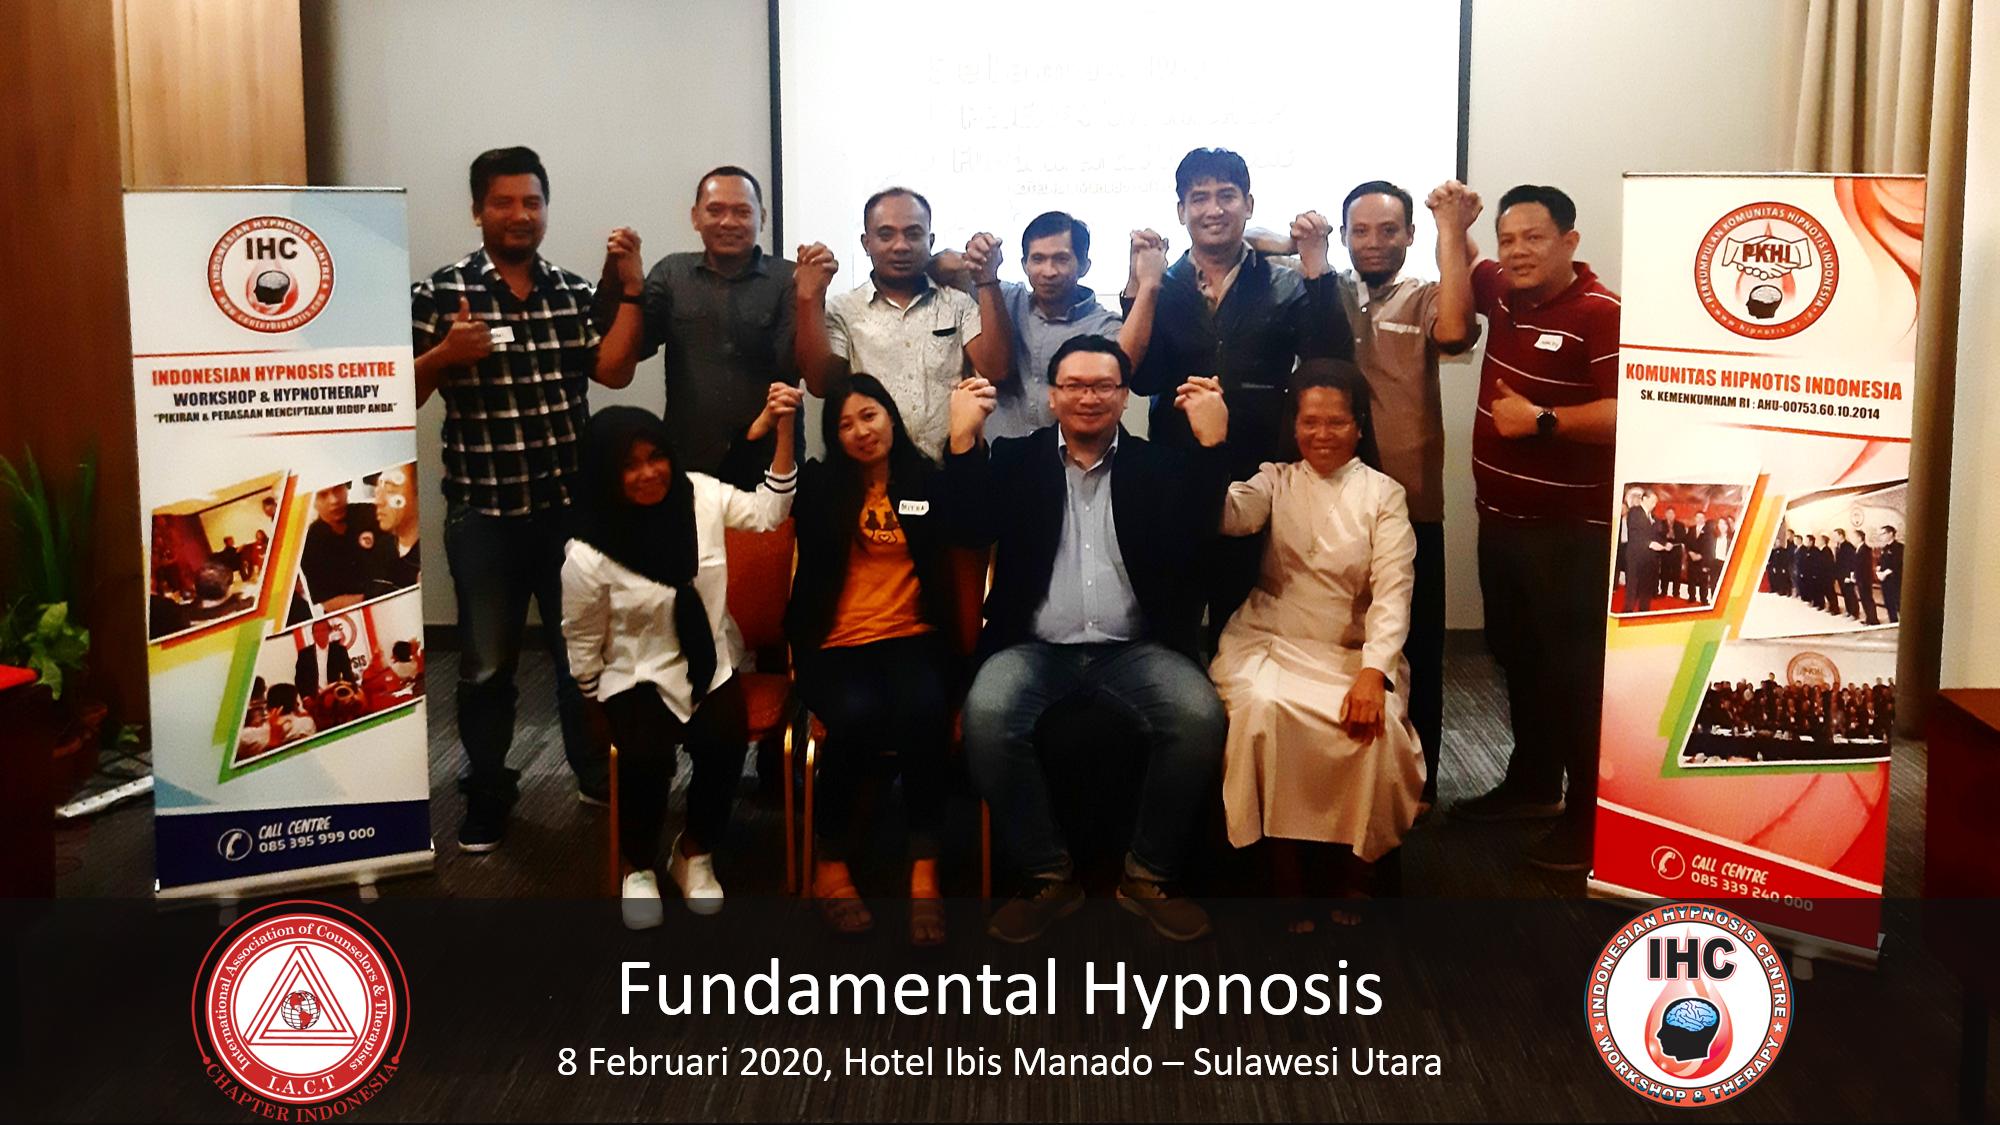 Andri Hakim05 - Fundamental Hypnosis - Februari 9, Manado 2020